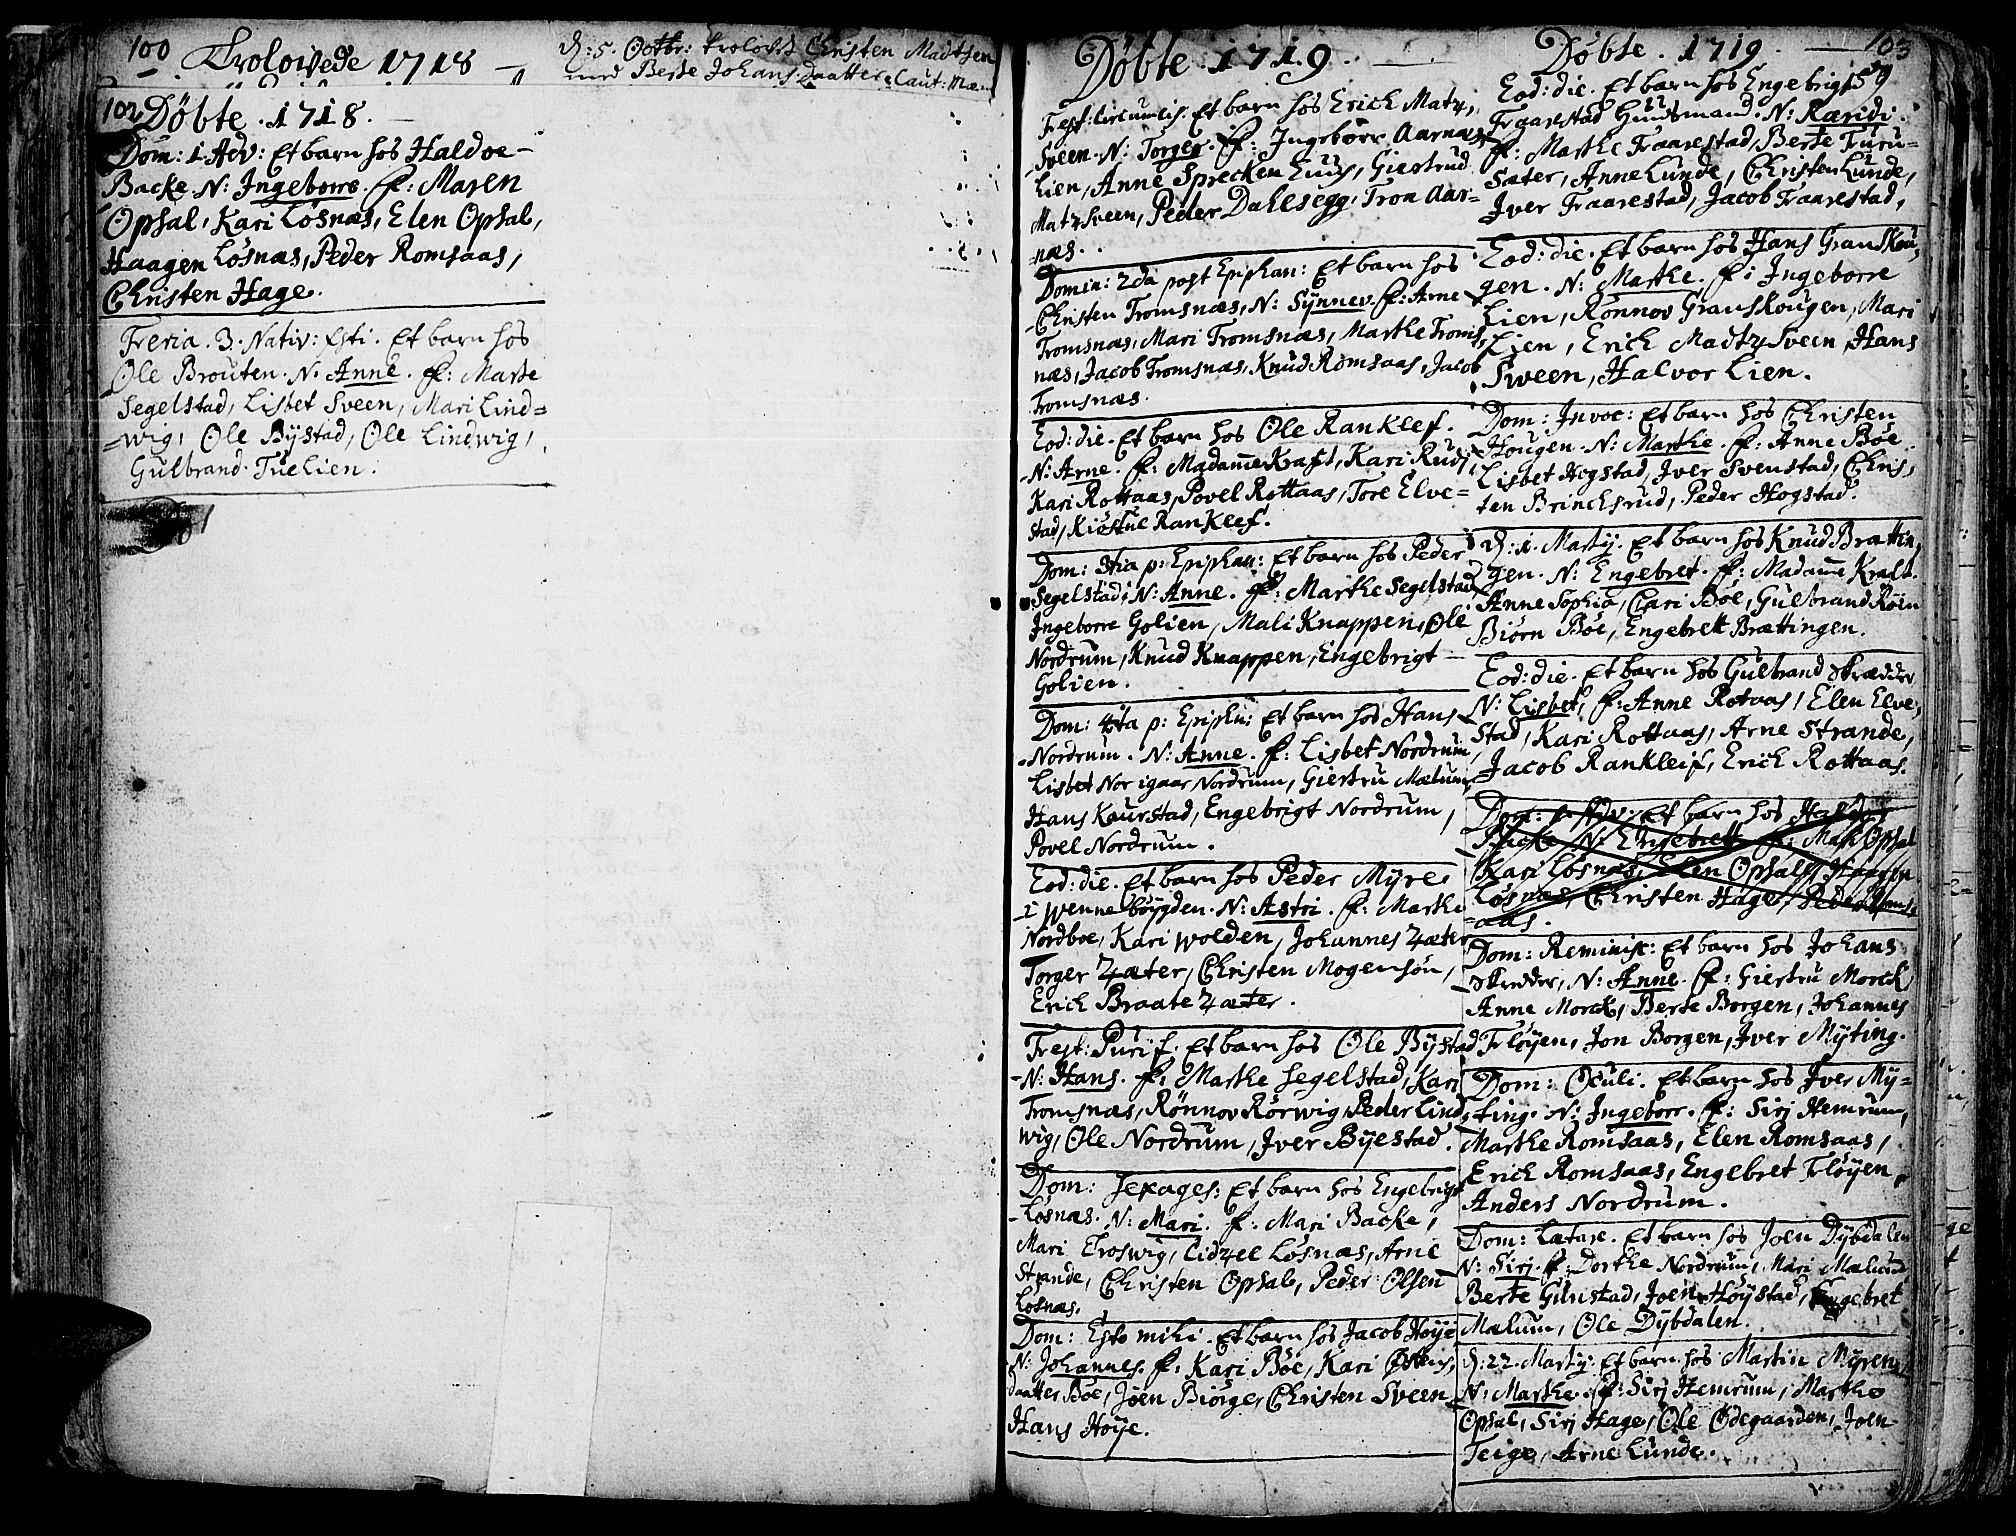 SAH, Ringebu prestekontor, Ministerialbok nr. 1, 1696-1733, s. 102-103